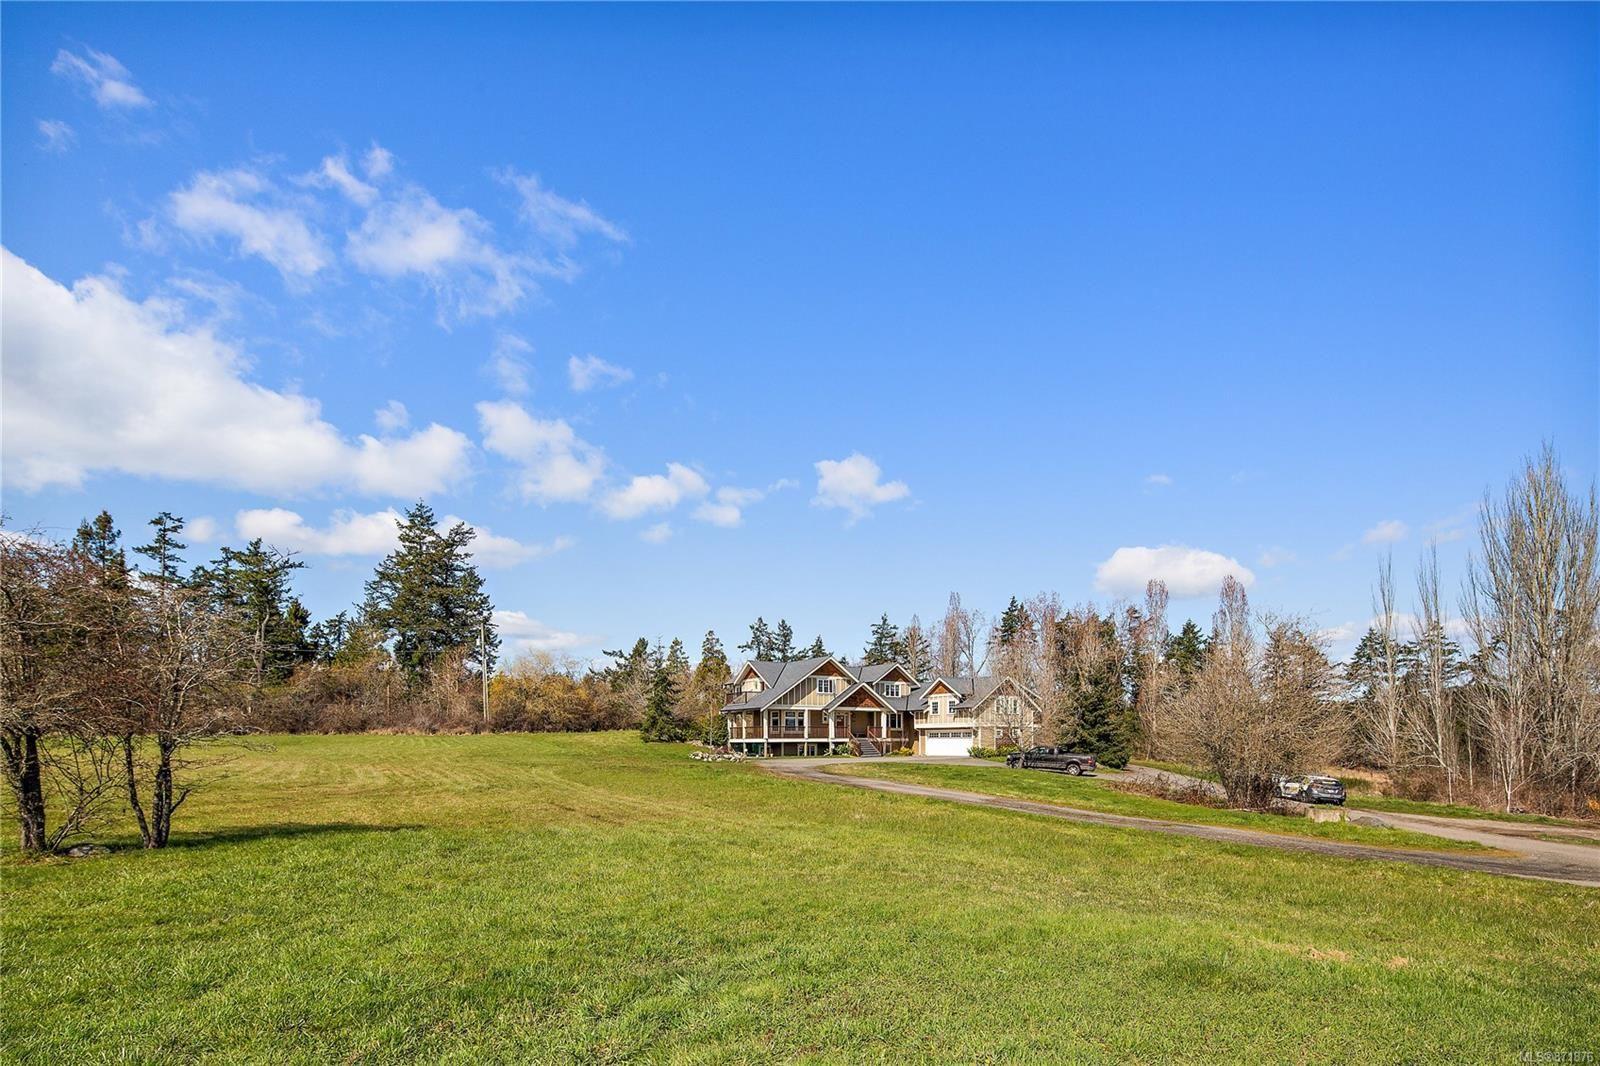 Photo 46: Photos: 4420 Wilkinson Rd in : SW Royal Oak House for sale (Saanich West)  : MLS®# 871876